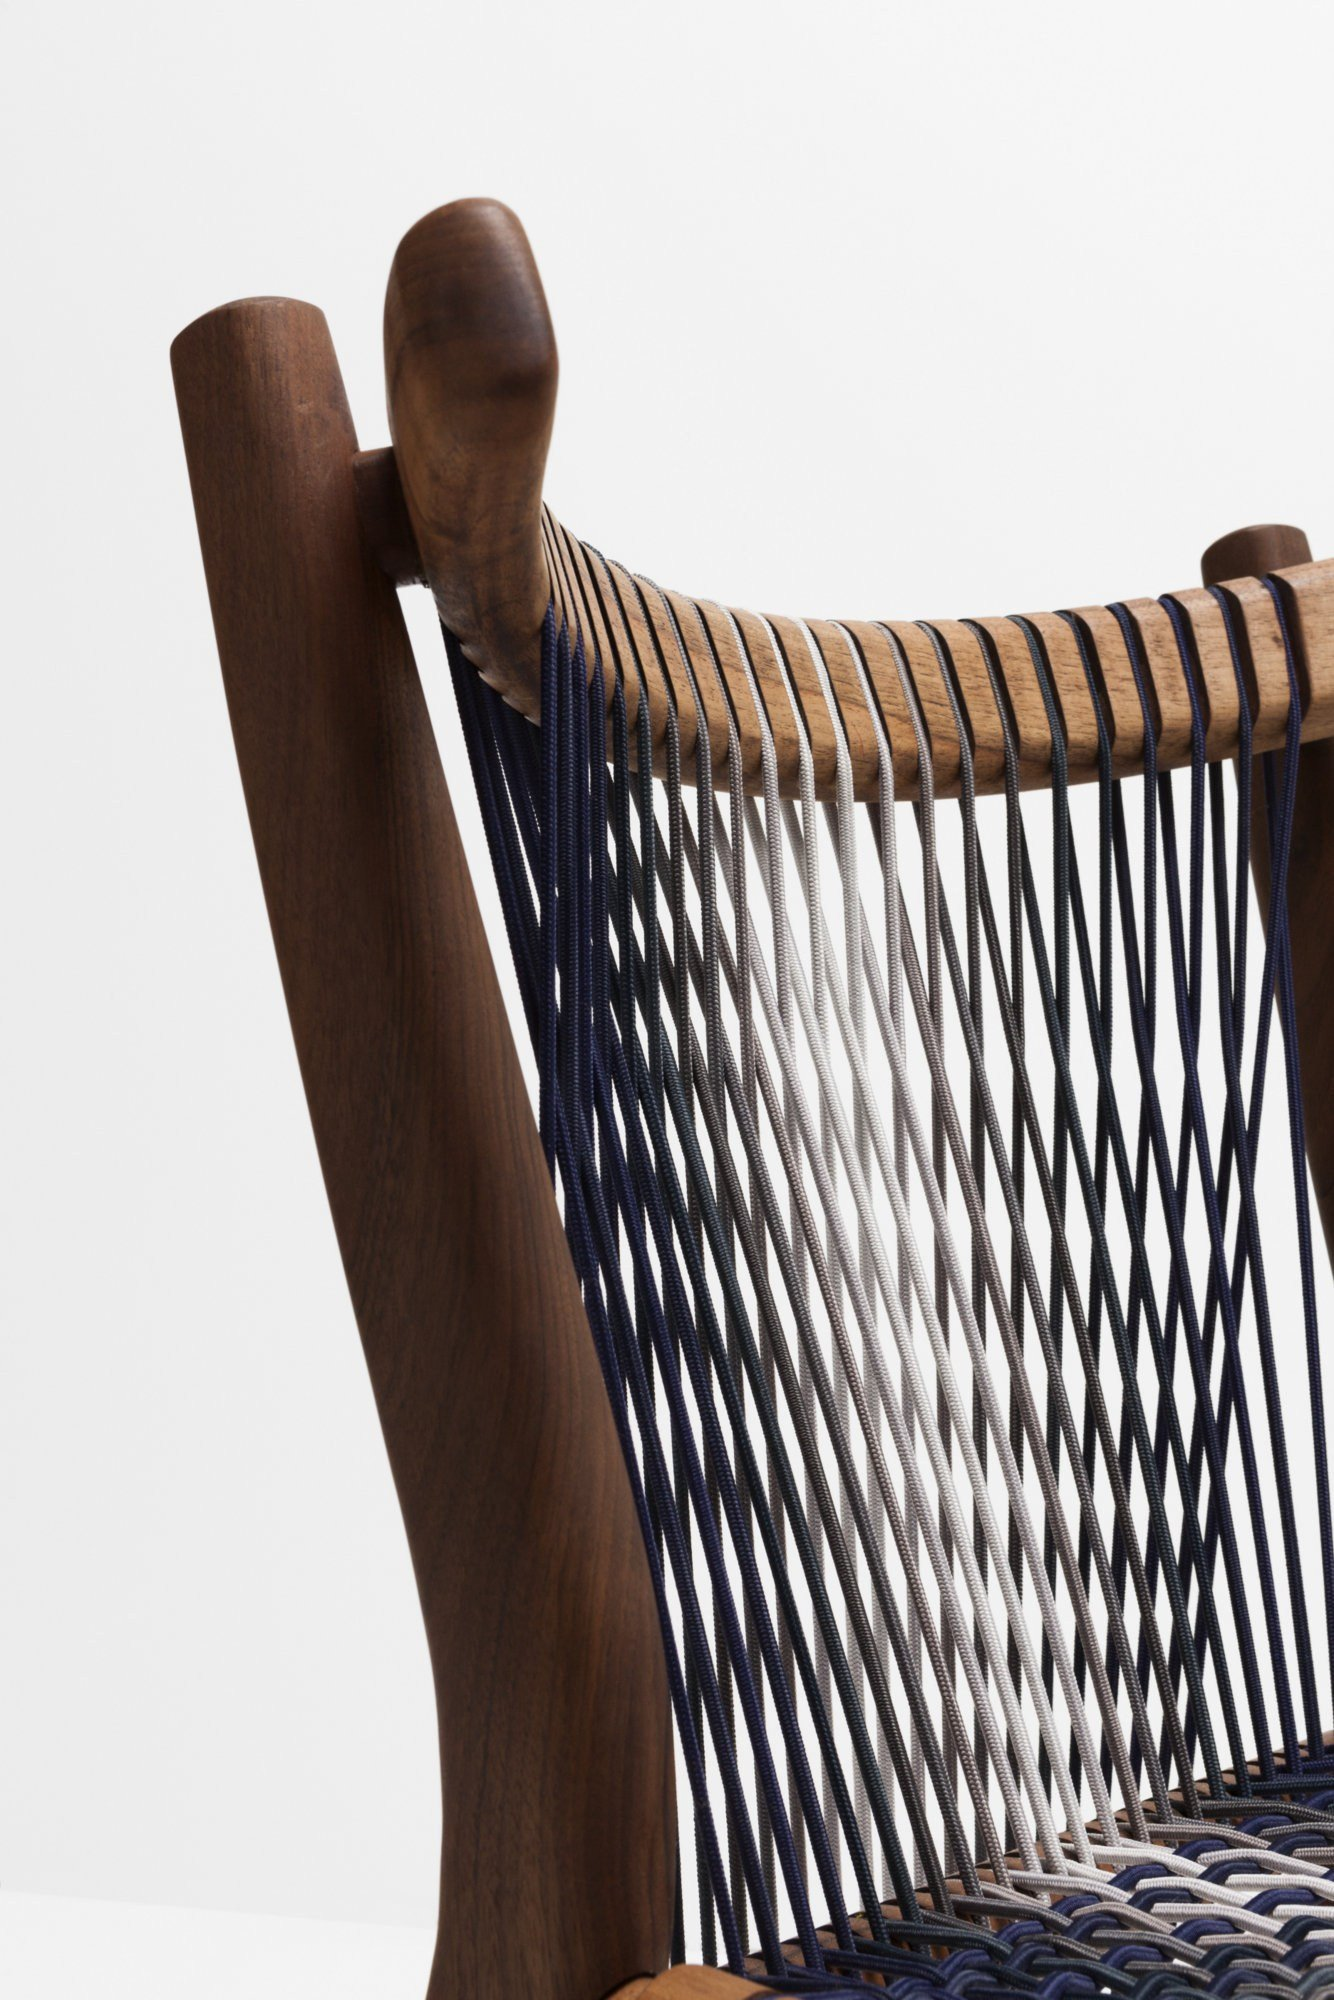 LOOM BY PTOLEMY MANN | Chair By H Furniture Design Hierve, Ptolemy Mann